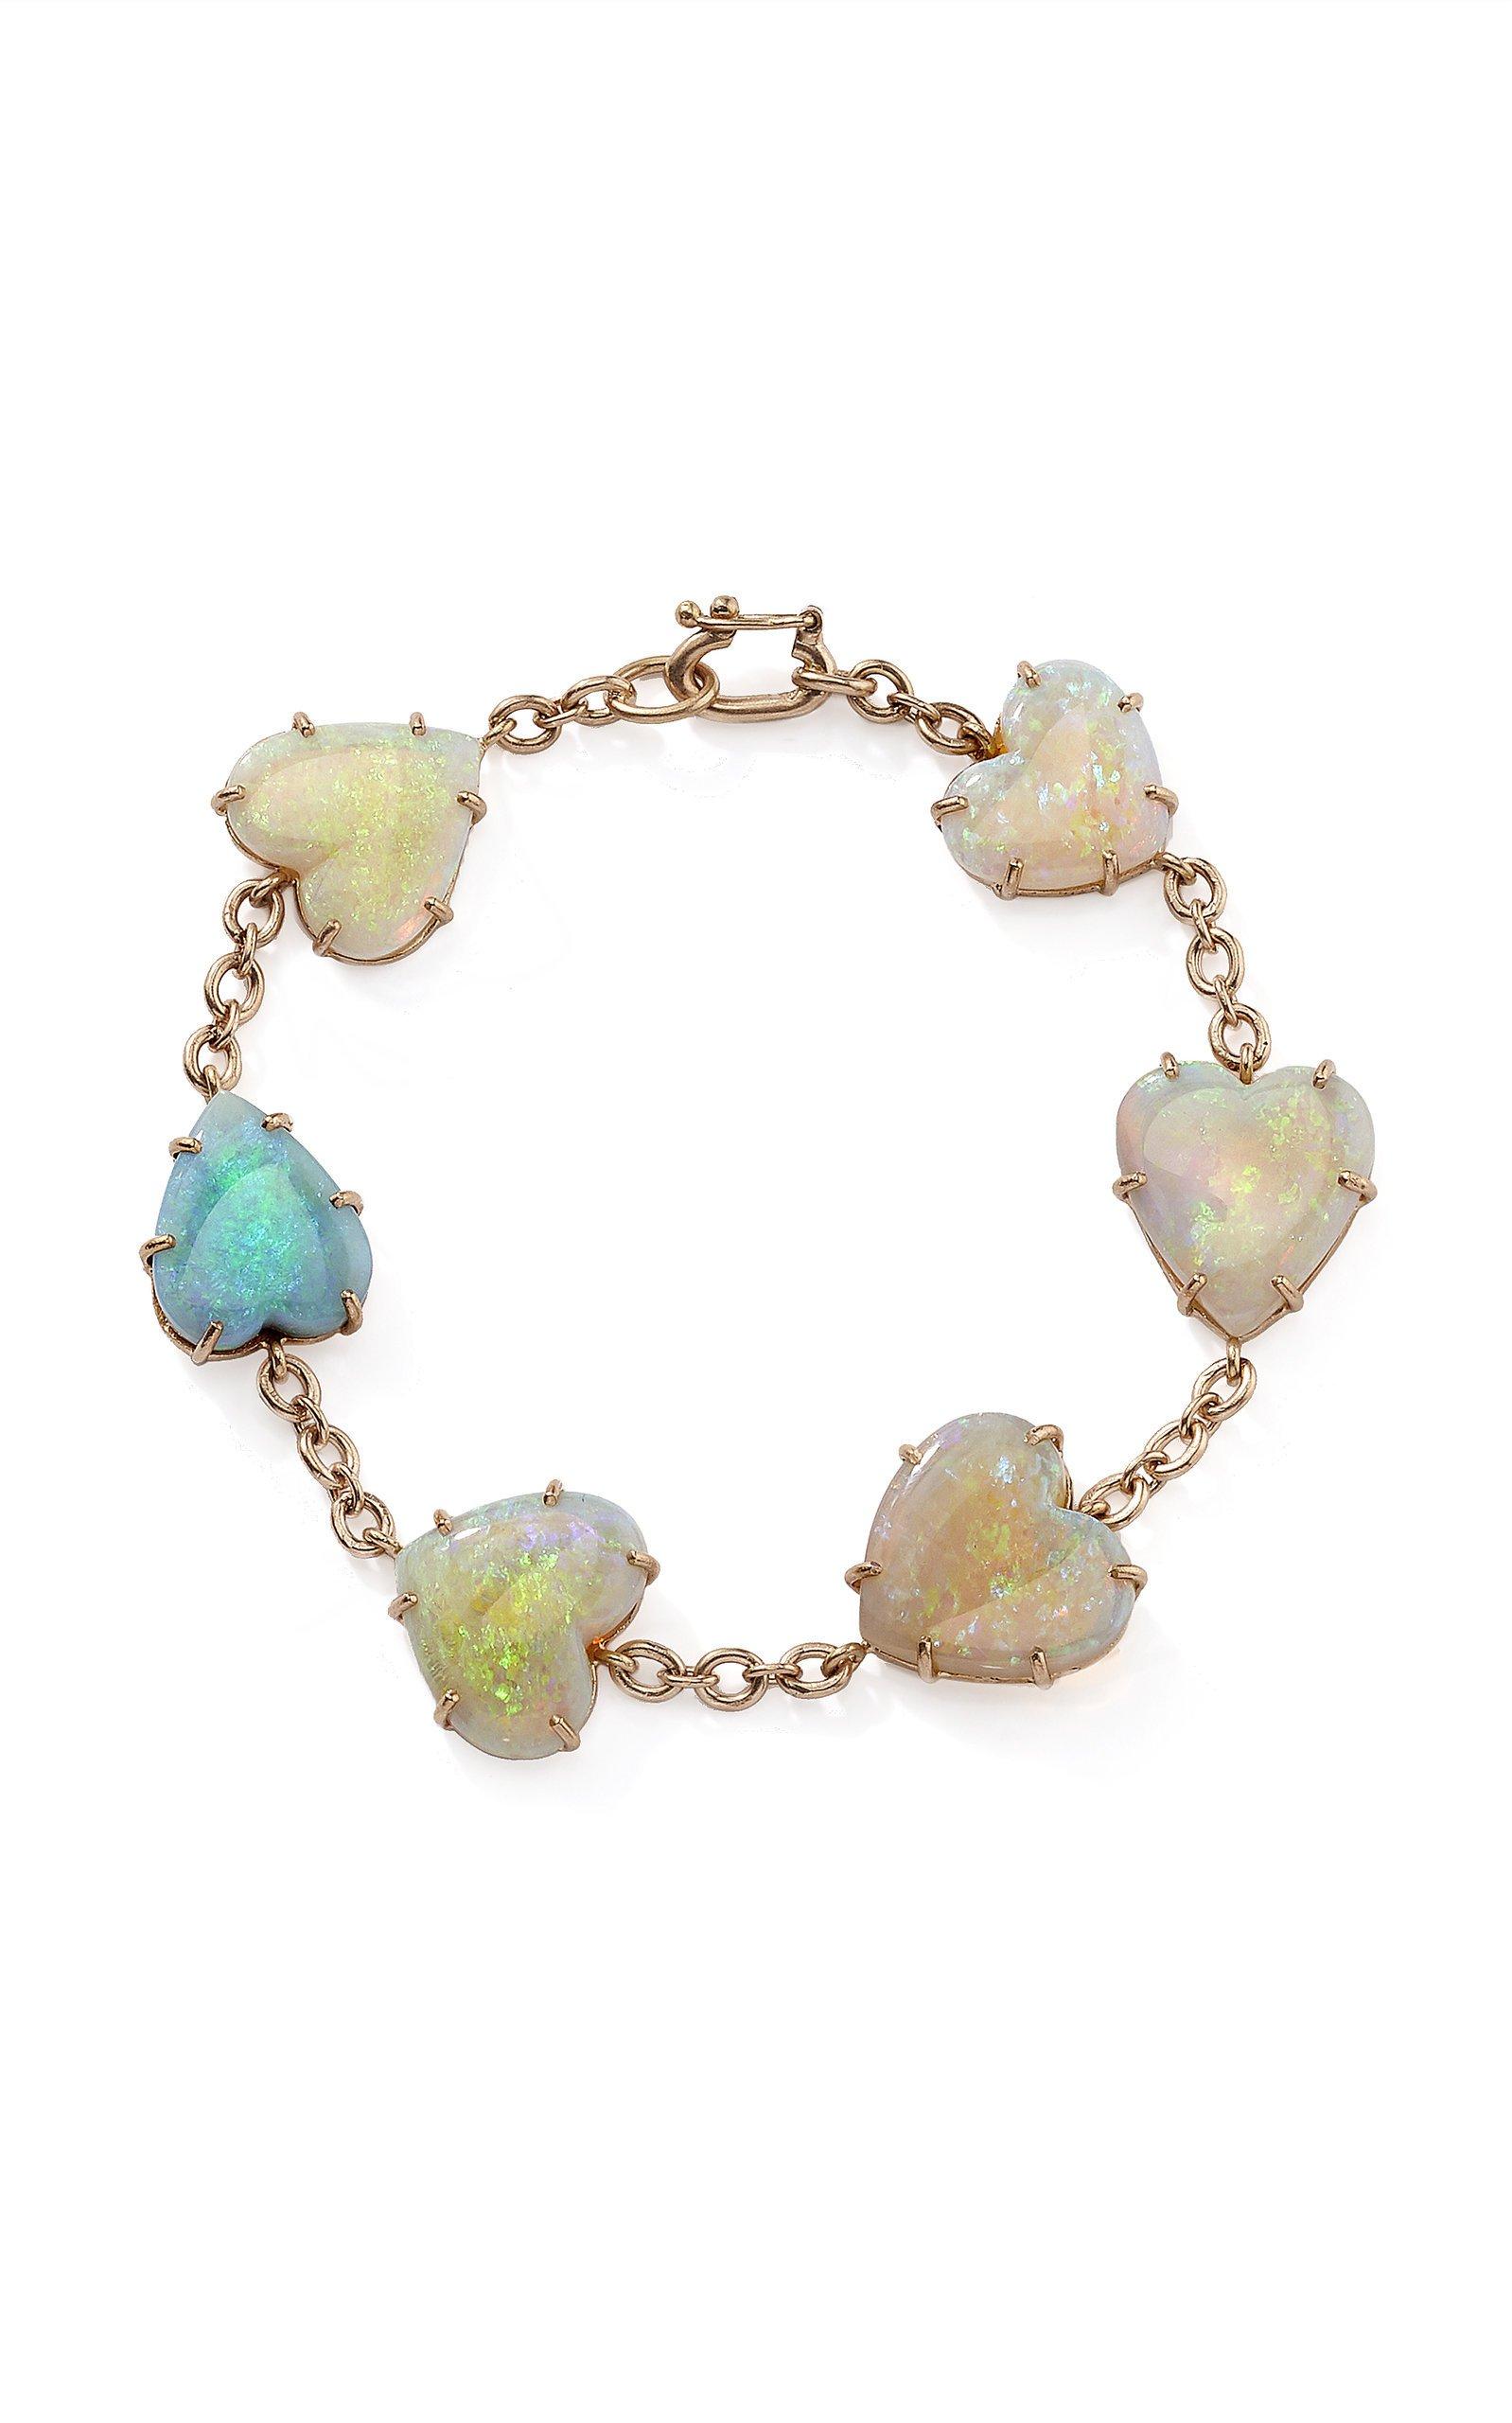 One-Of-A-Kind 18K Rose Gold Opal Hearts Bracelet by Irene Neuwirth   Moda Operandi